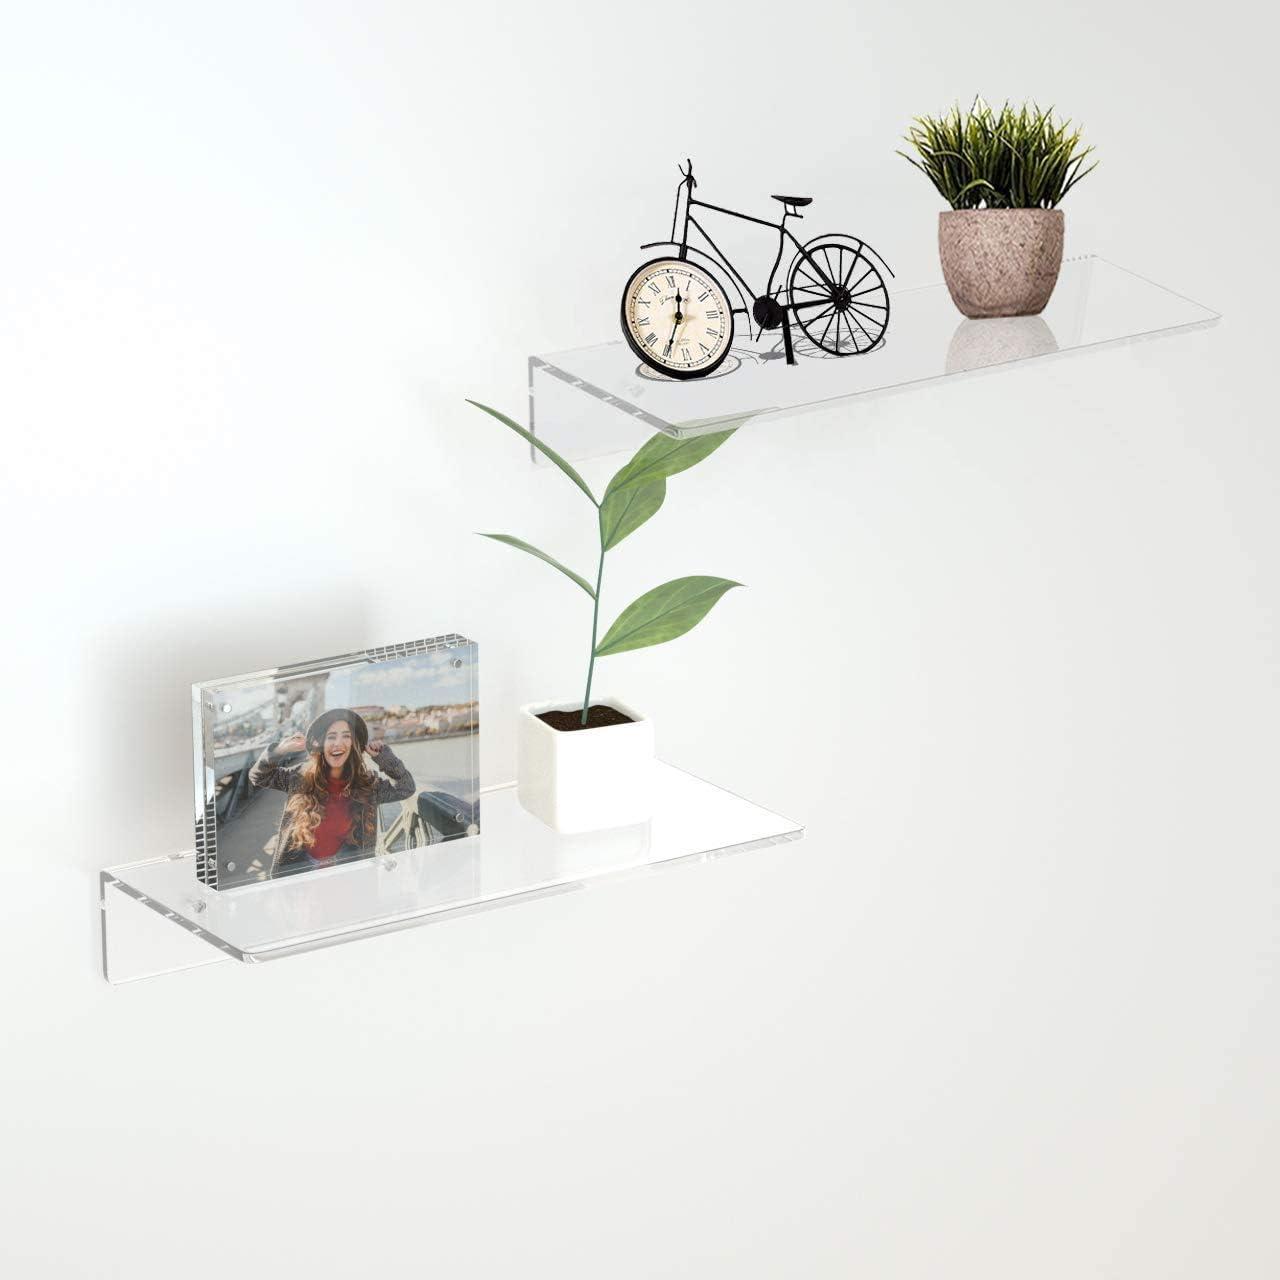 Weathered Grey Wall Mounted Storage Shelves for Bedroom Acrylic Wall Shelves Set of 2 HIIMIEI Floating Shelves Living Room Kitchen Bathroom